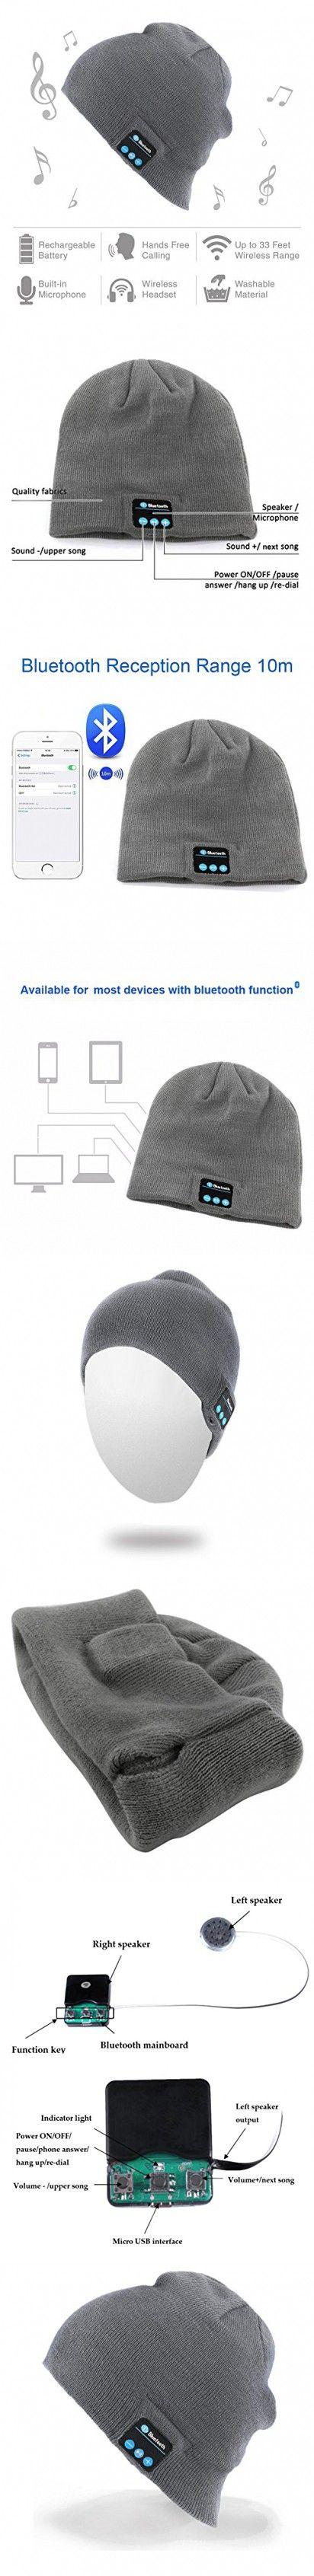 Momoday® Bluetooth Music Soft Warm Beanie Hat Cap with Stereo Headphone Headset Speaker Wireless Mic Hands-free for Men Women Speaker Winter Outdoor Sport Best Gift (Light Grey)